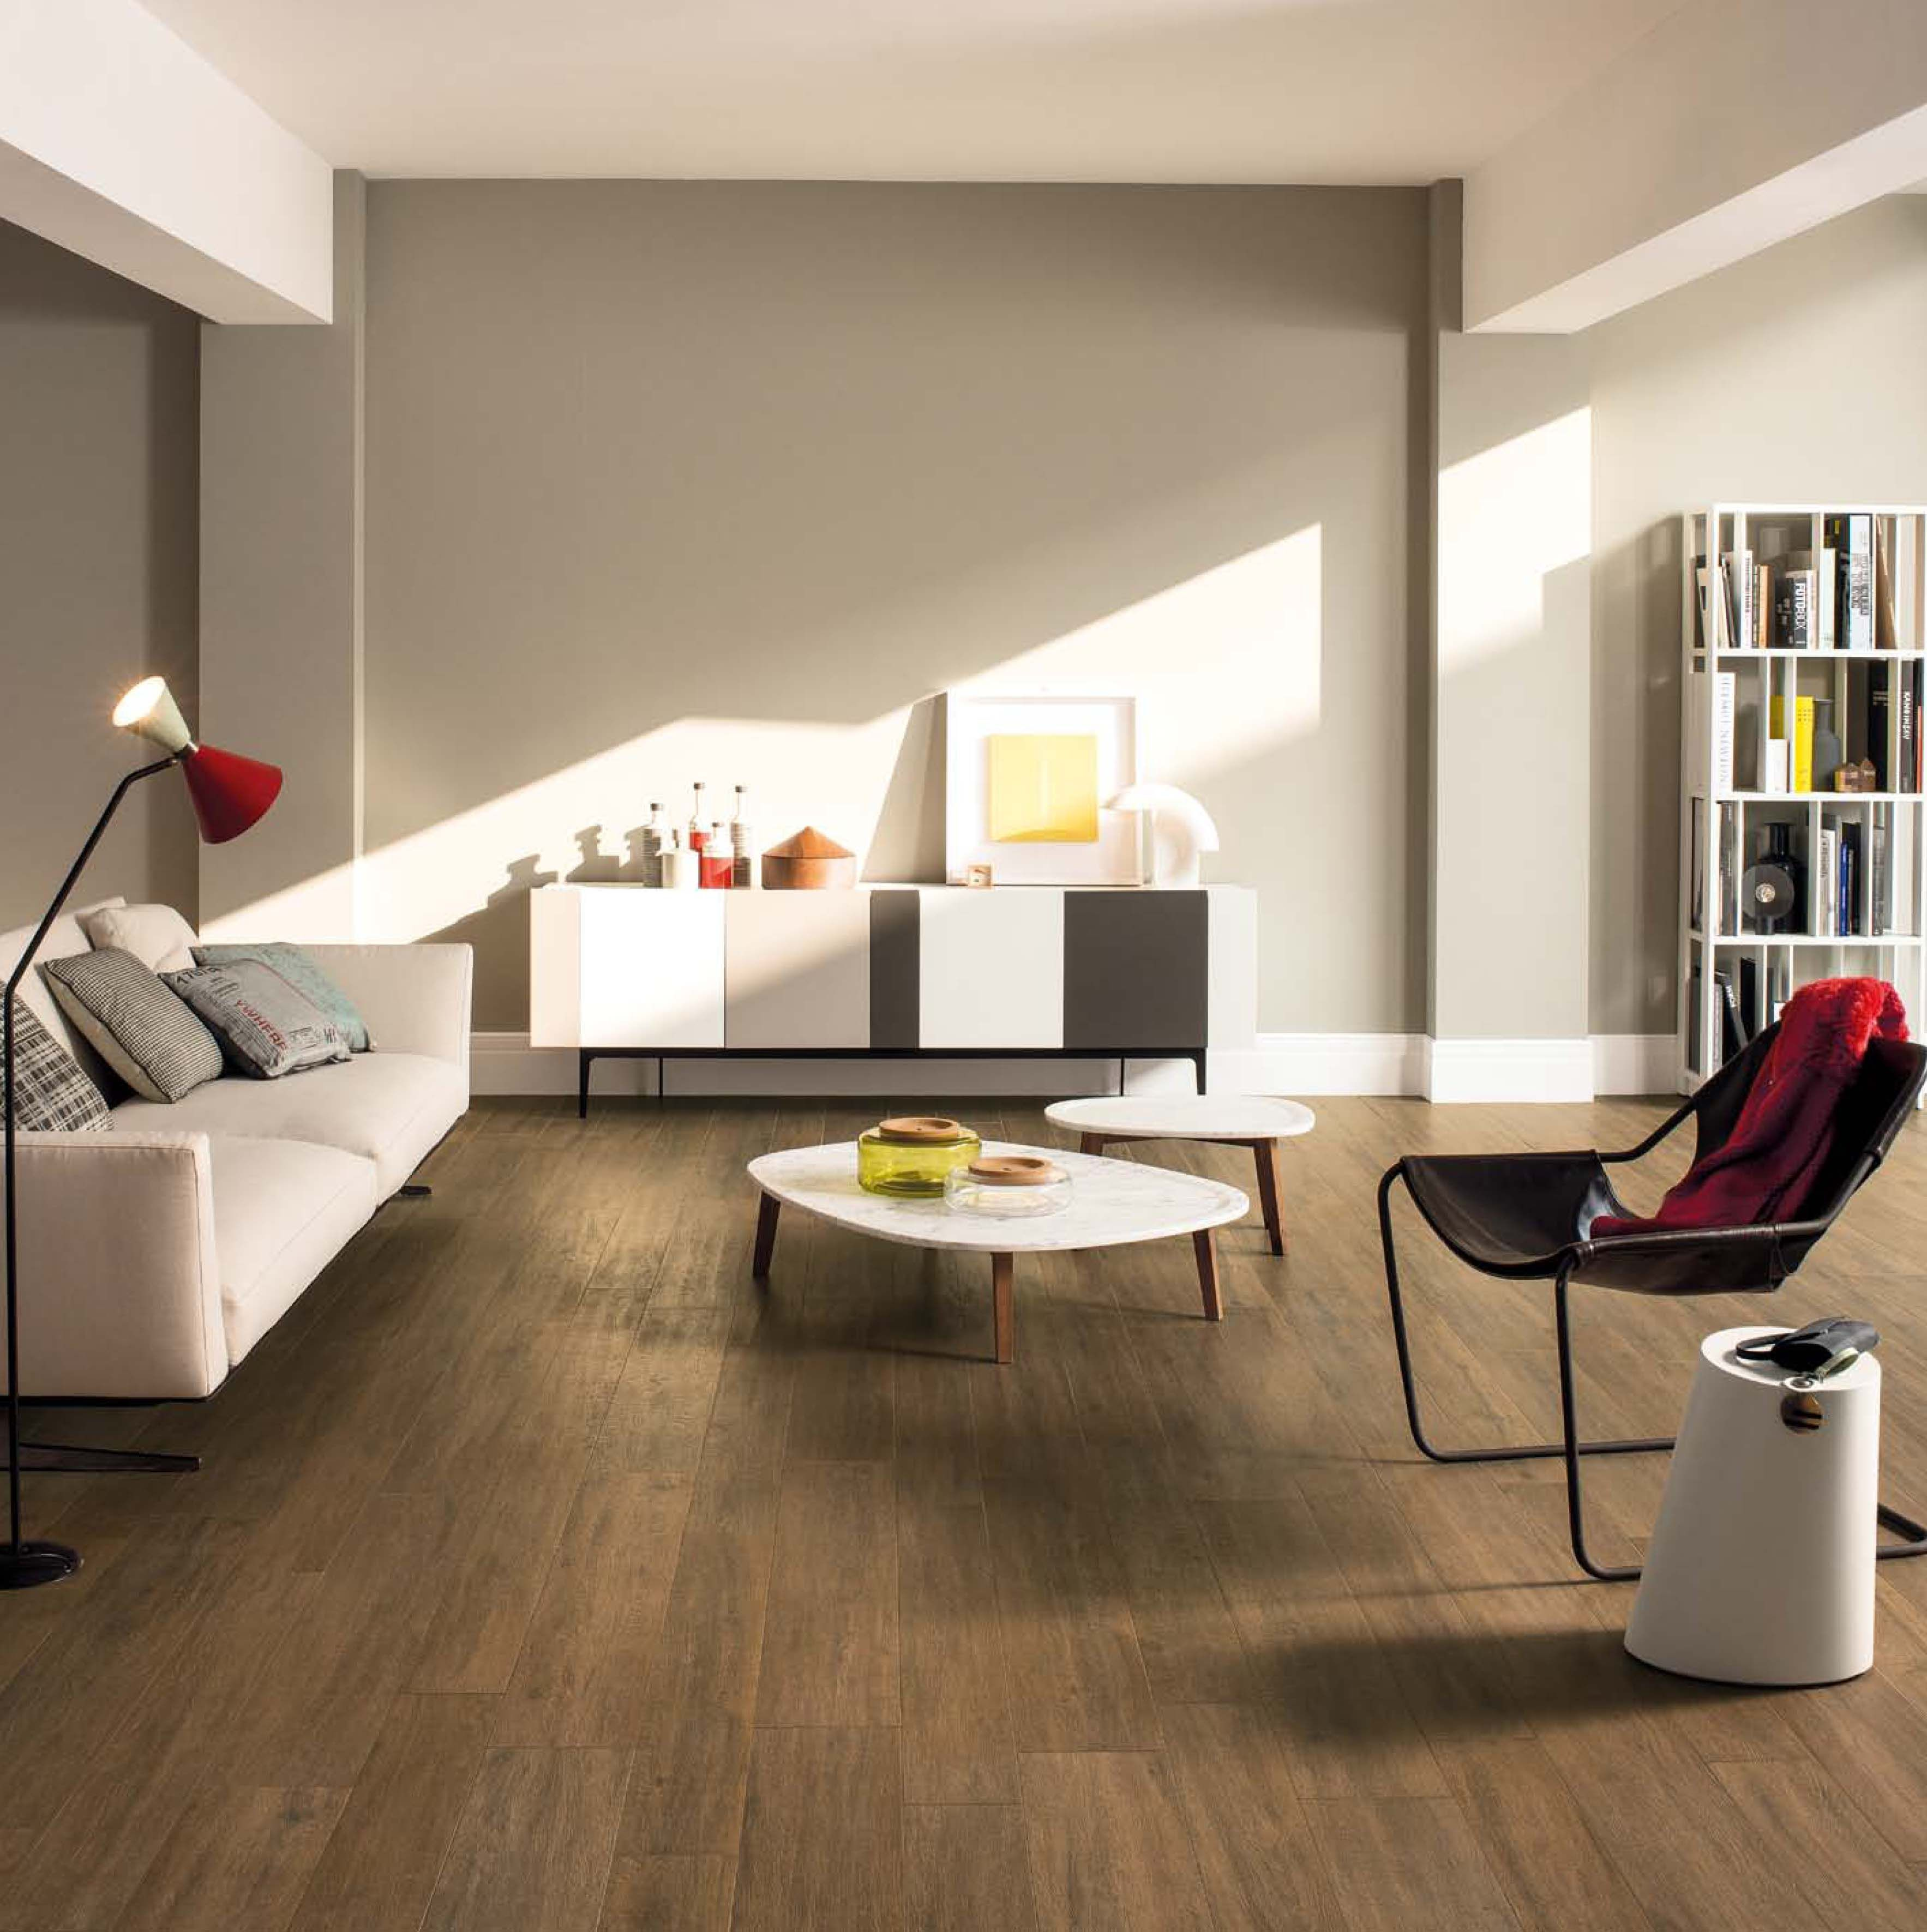 Modern Floor Tiles Design For Living Room Captivating Modern Livingroom With Wood Look Tile Porcelain Tiles  Pinterest Design Ideas